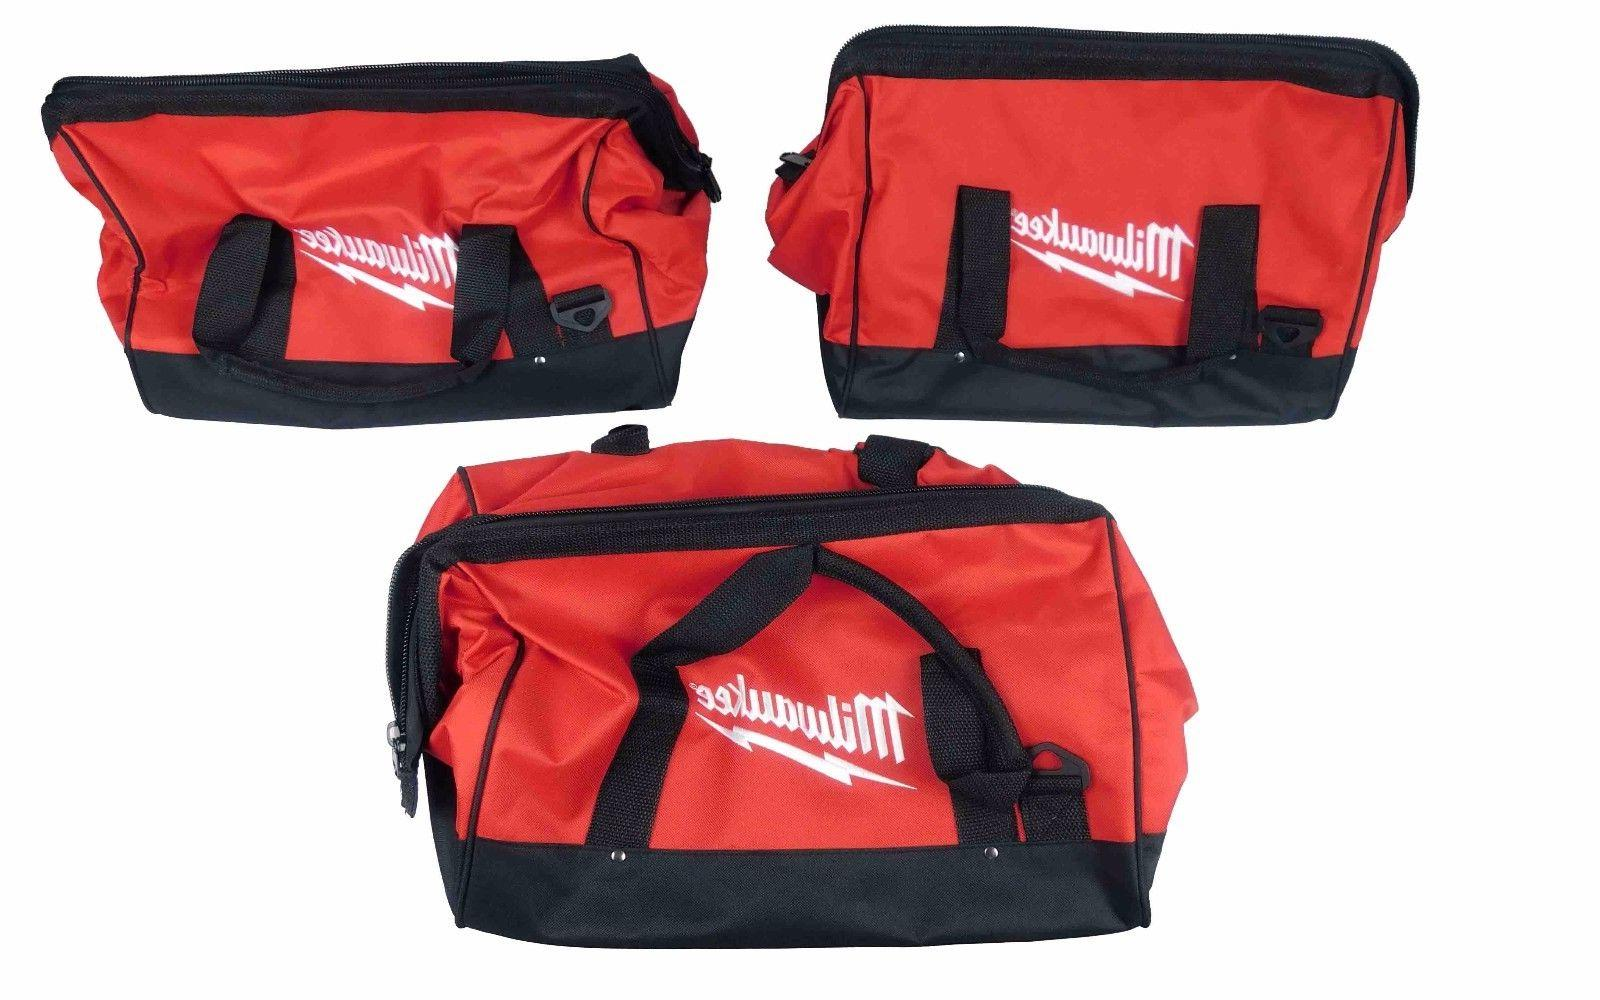 Milwaukee 6-Pocket Duty Industrial Carrying Tool Bag